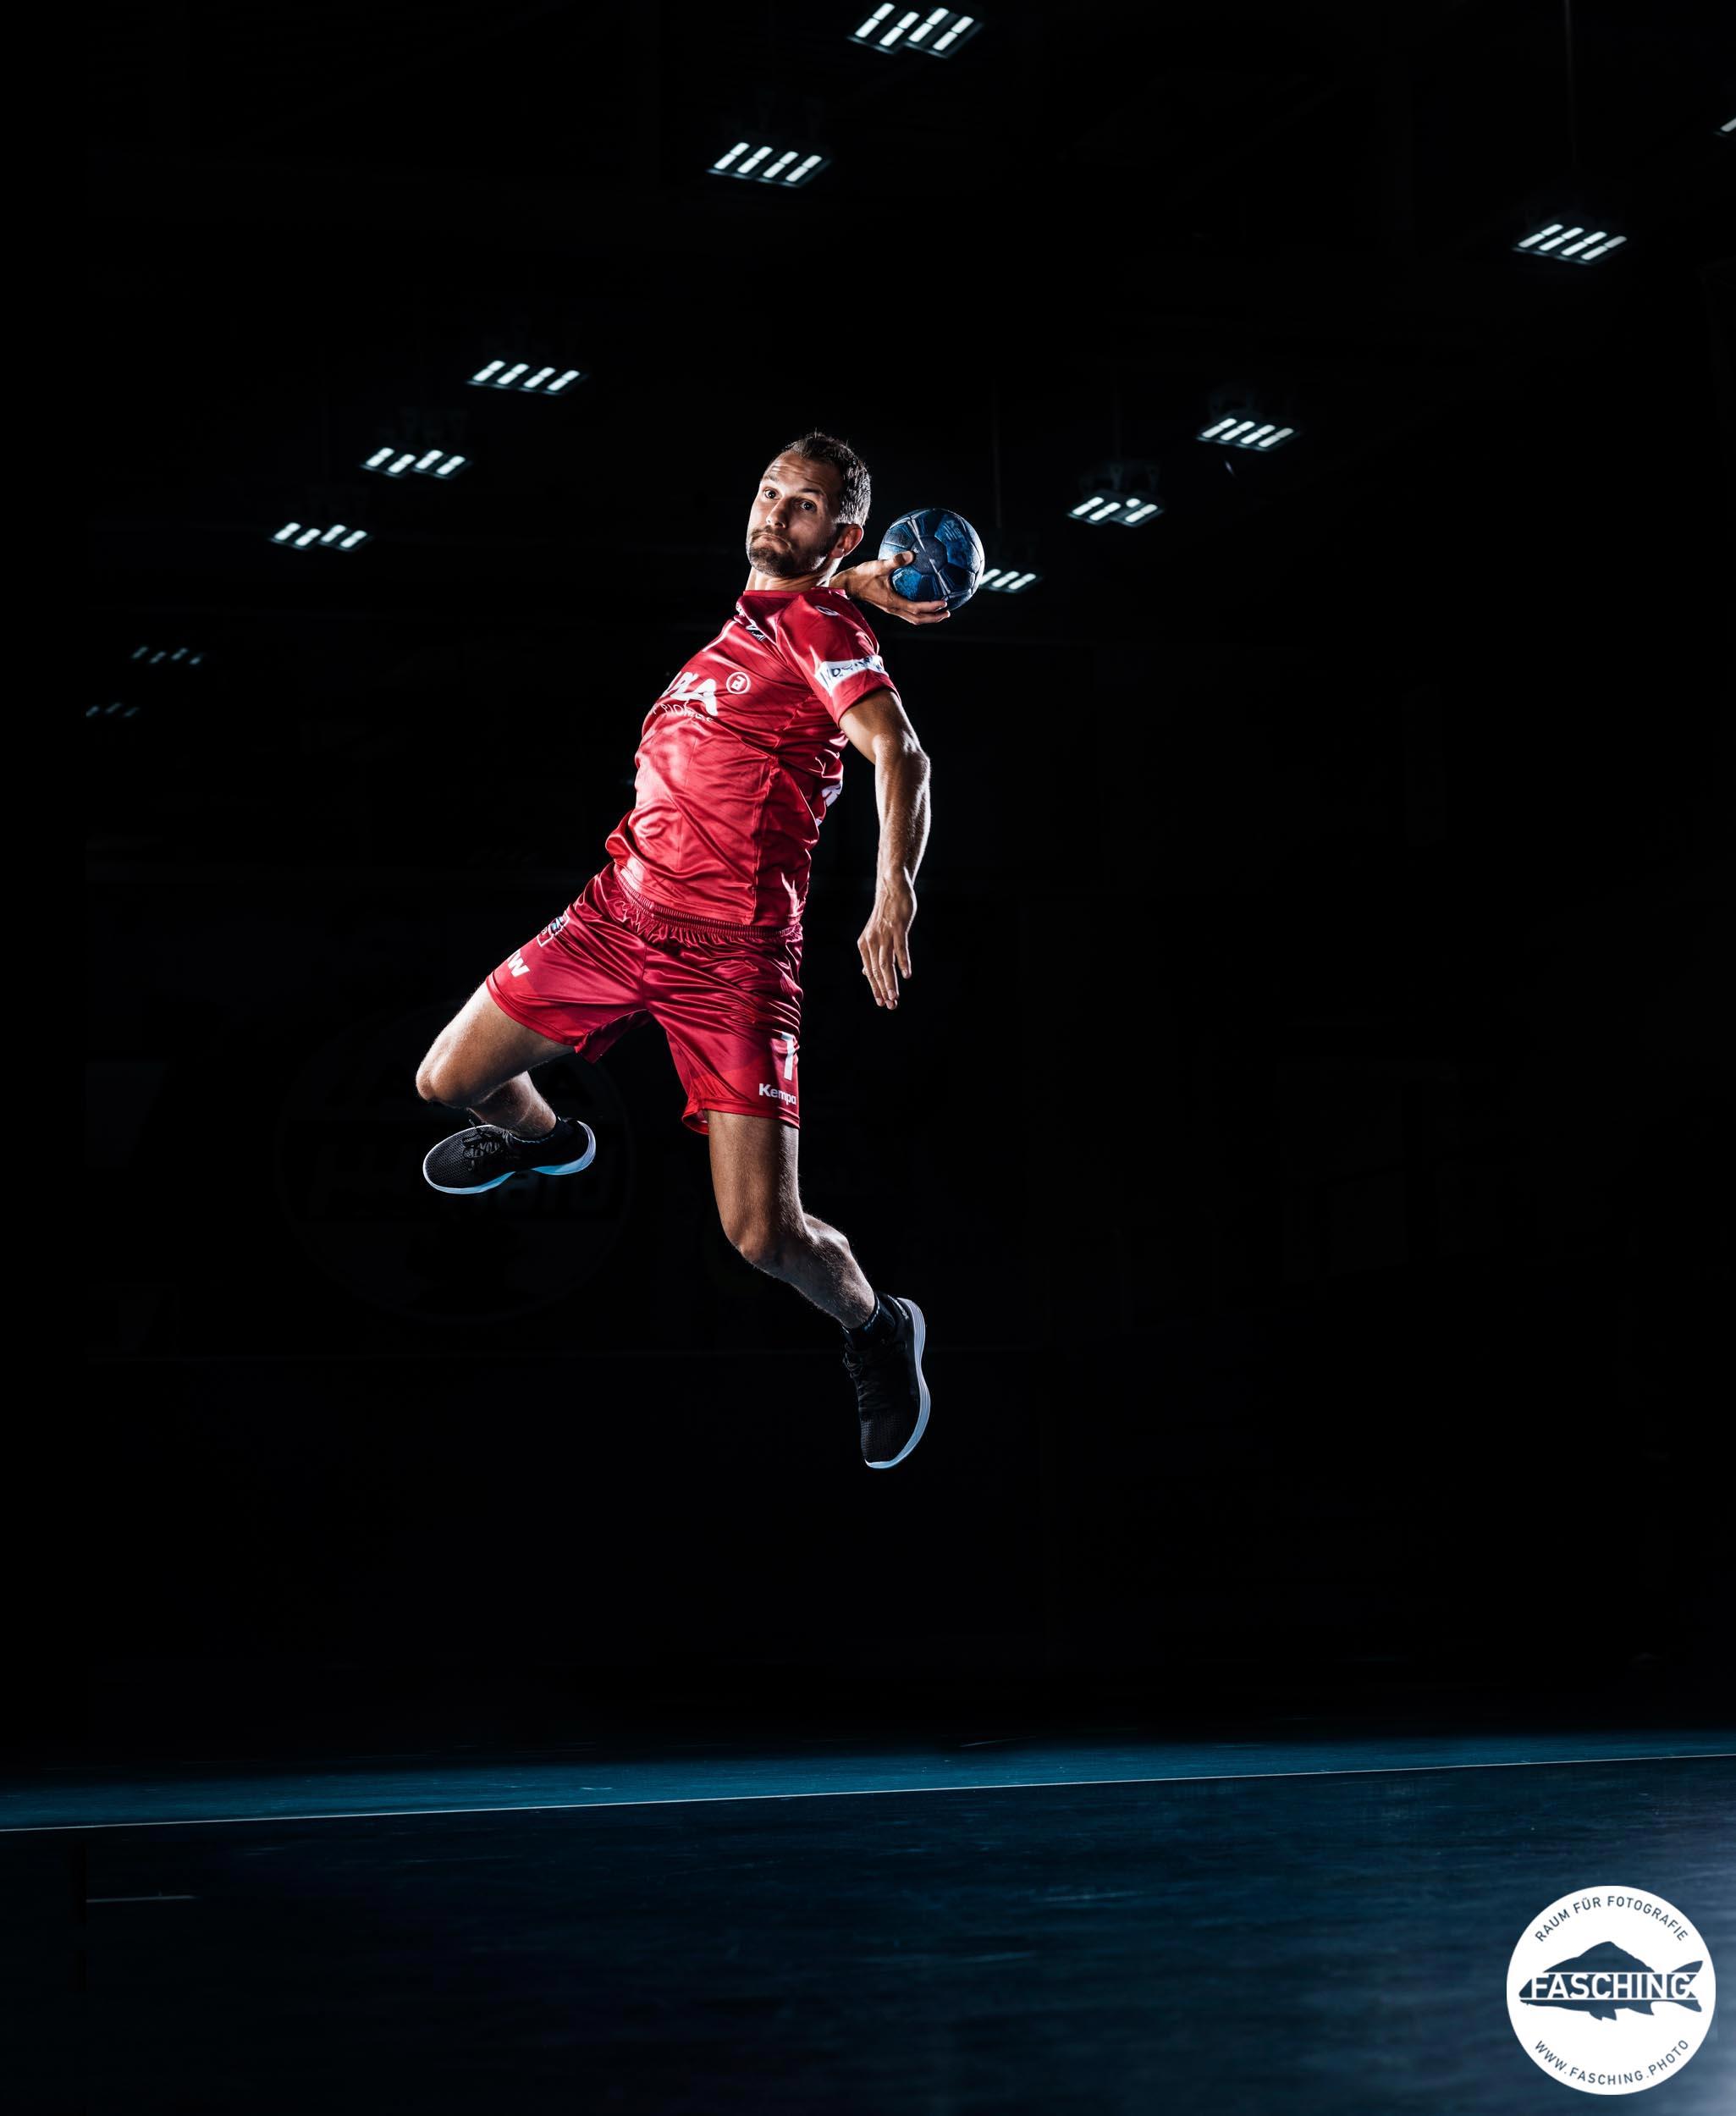 Actionbild Handballer, Fotograf Luca Fasching, Fotostudio Fasching Bregenz, Vorarlberg